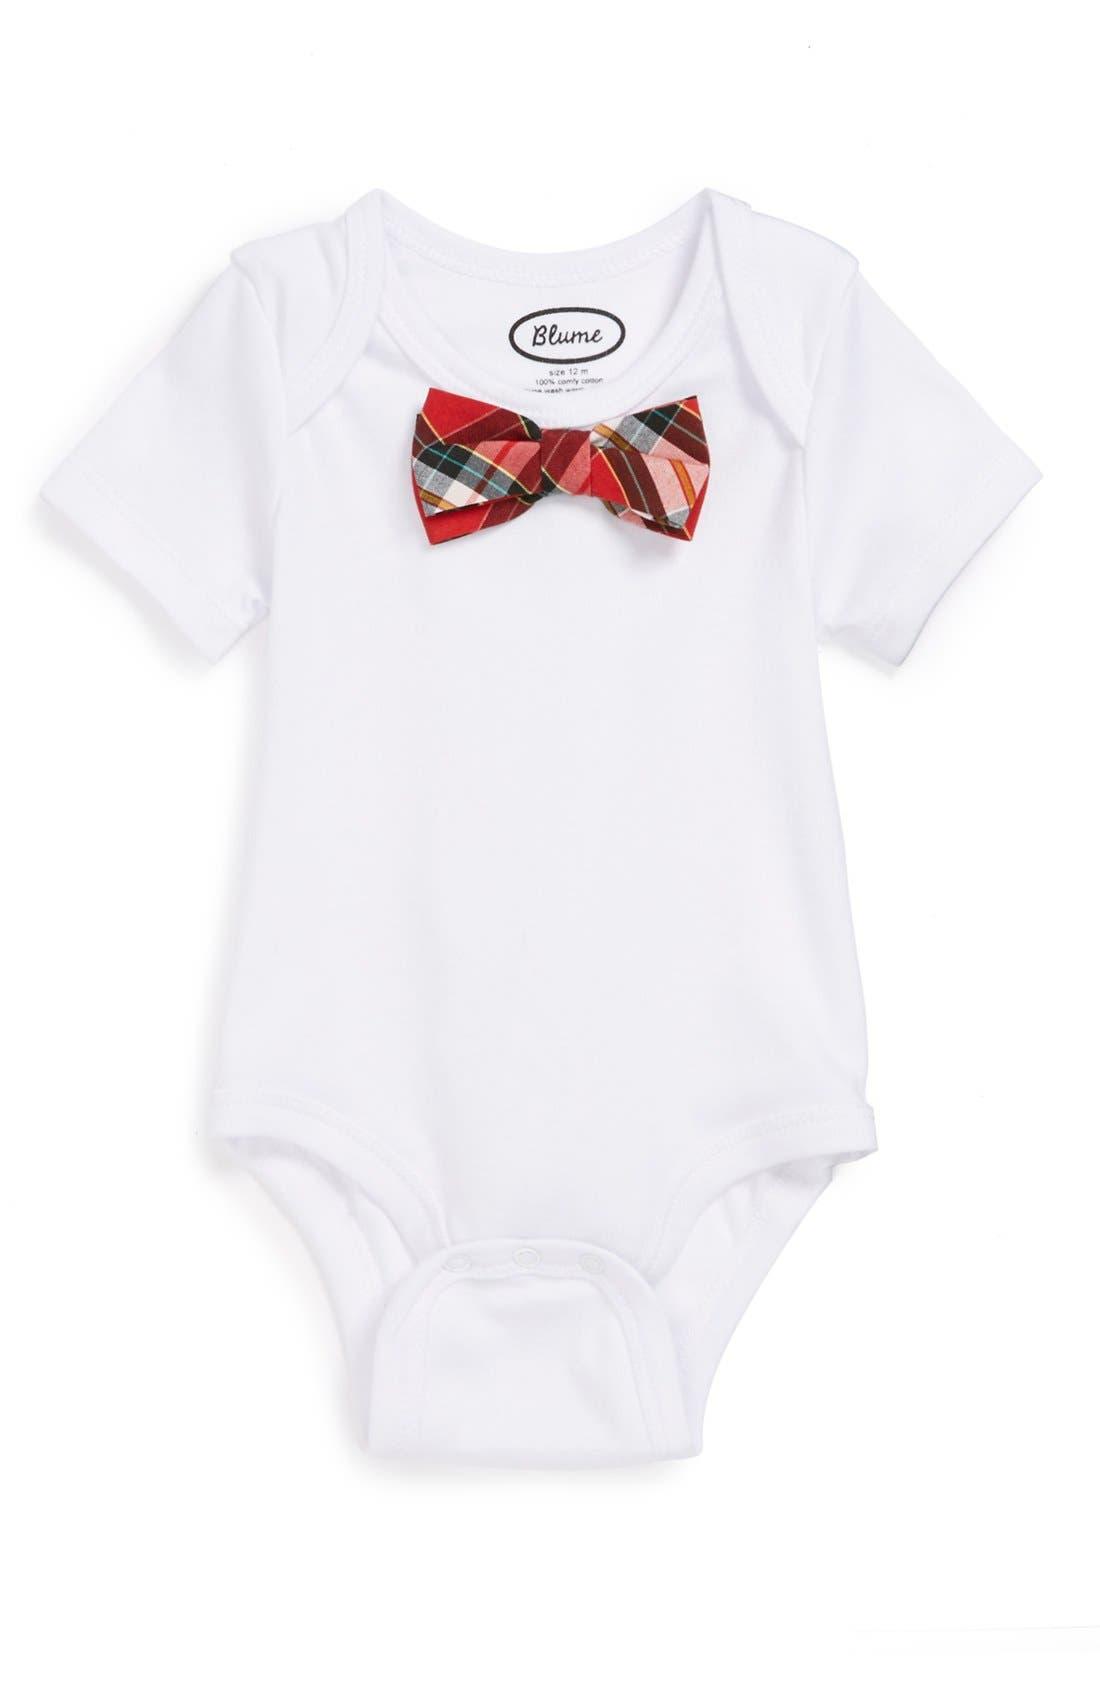 Main Image - Blume 'Bow Tie' Bodysuit (Baby Boys)